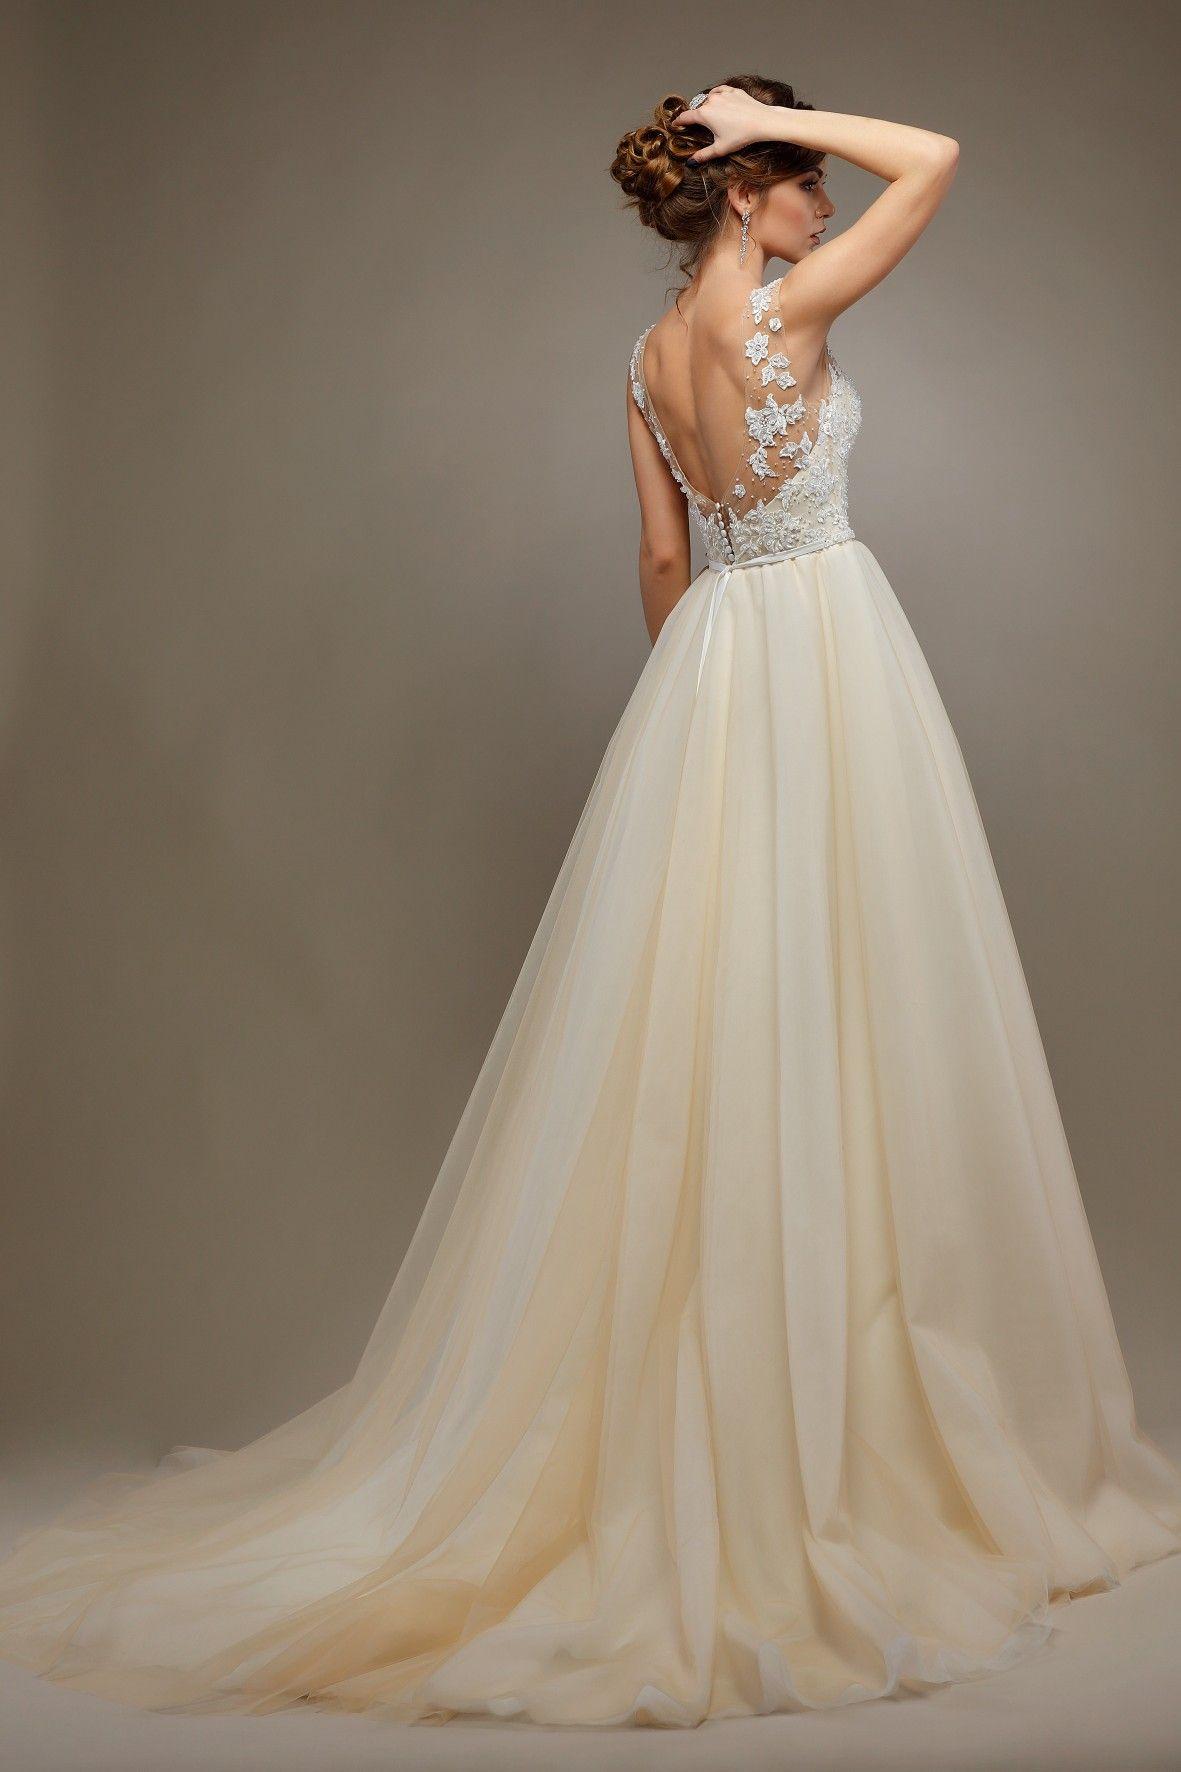 Art 1105 Www Schantal De Anprobe Braut Brautkleid Brautmode